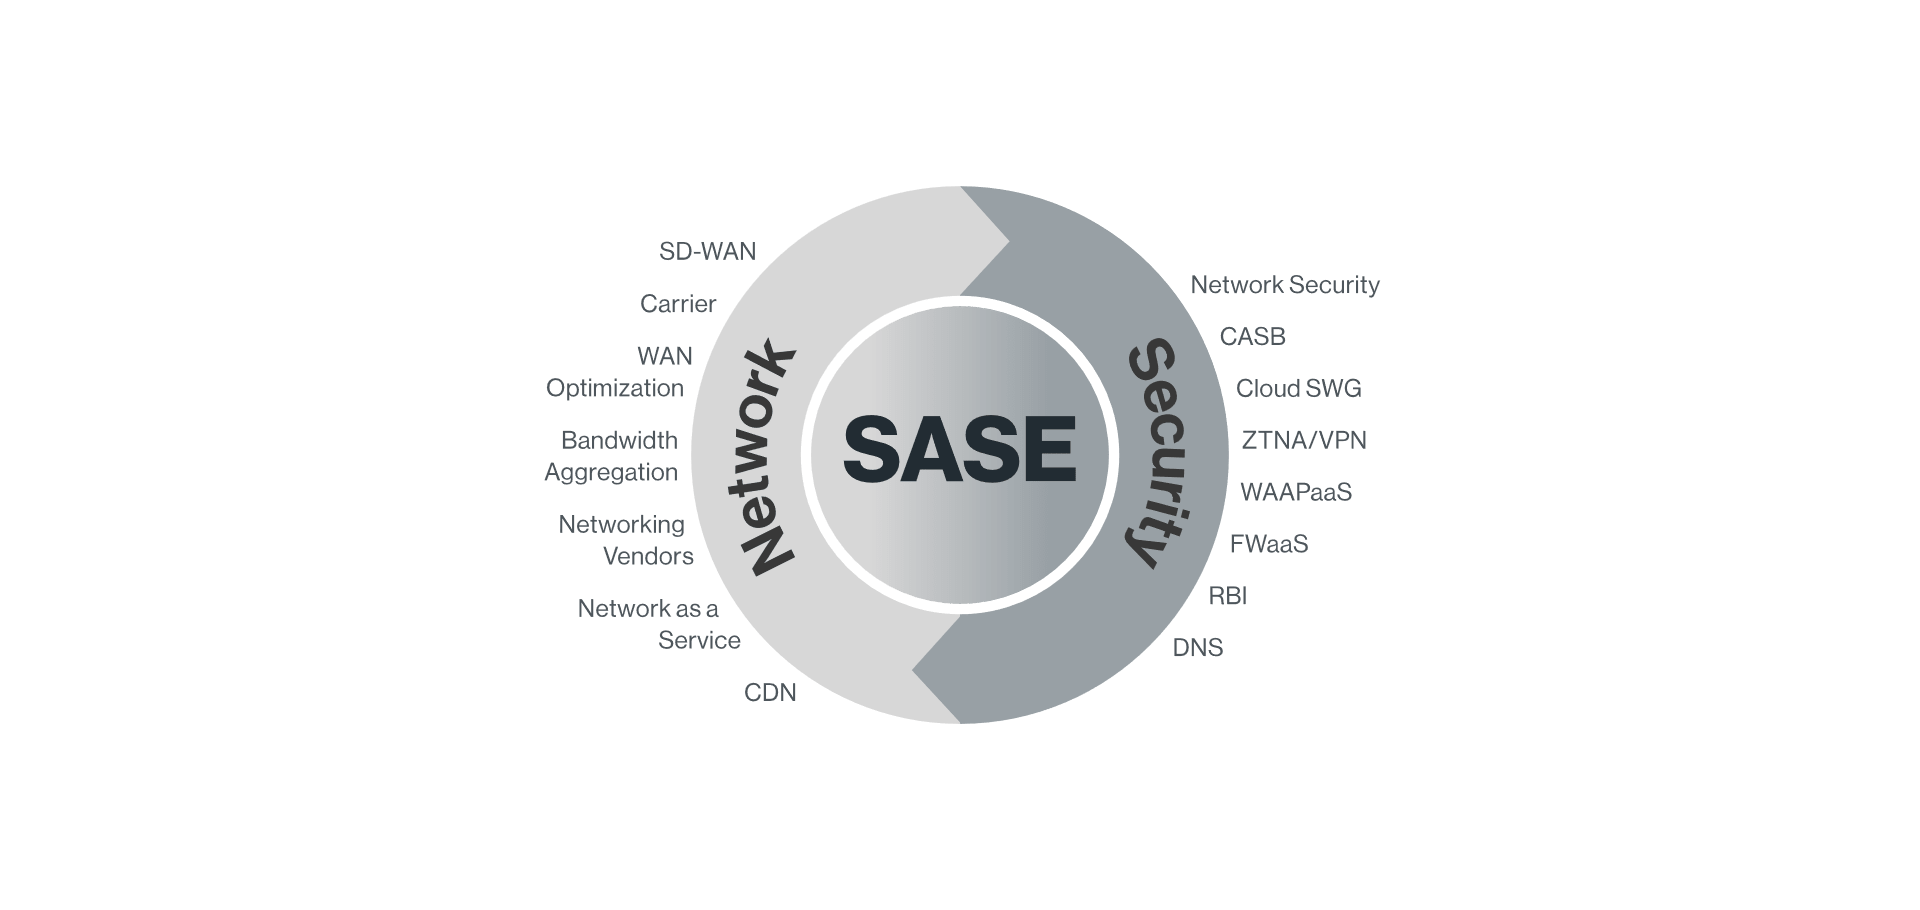 SASE network